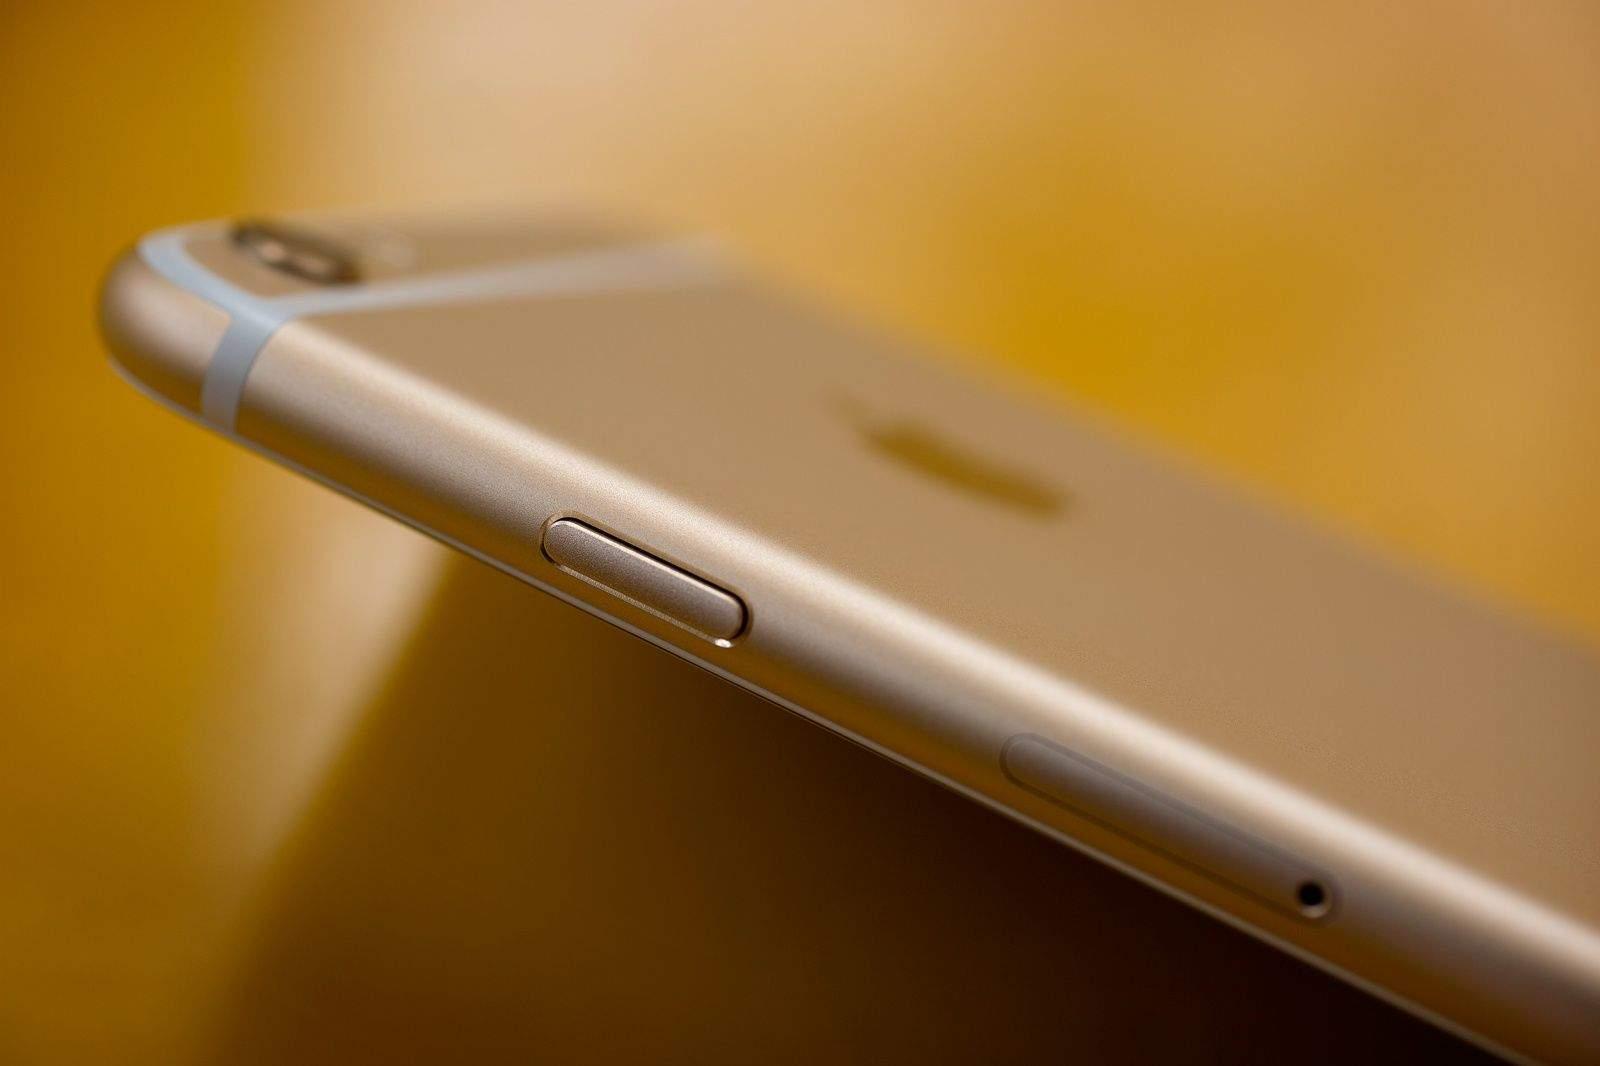 iPhone 6 Photo: Jim Merithew/Cult of Mac